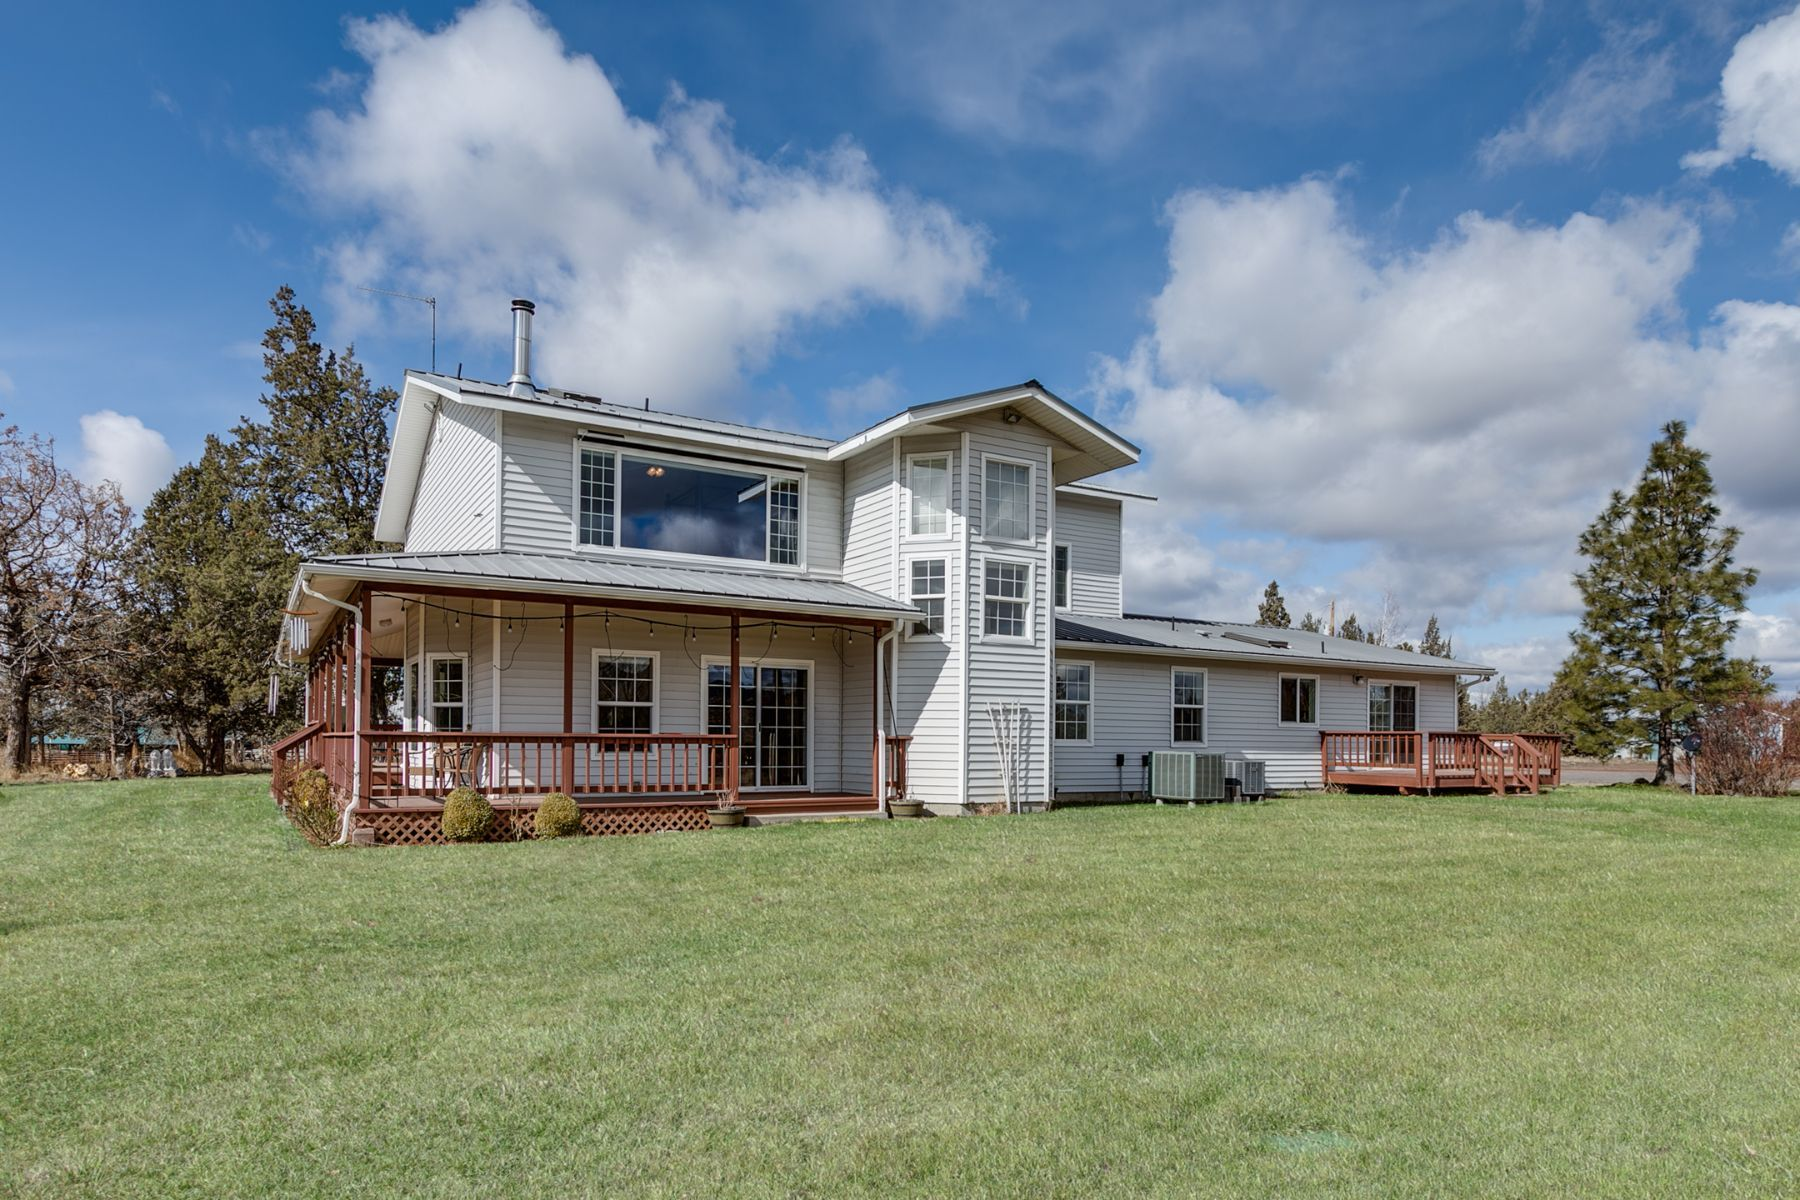 Other Residential Homes για την Πώληση στο 10541 NW Wimp Way Terrebonne, OR 97760 Terrebonne, Ορεγκον 97760 Ηνωμένες Πολιτείες